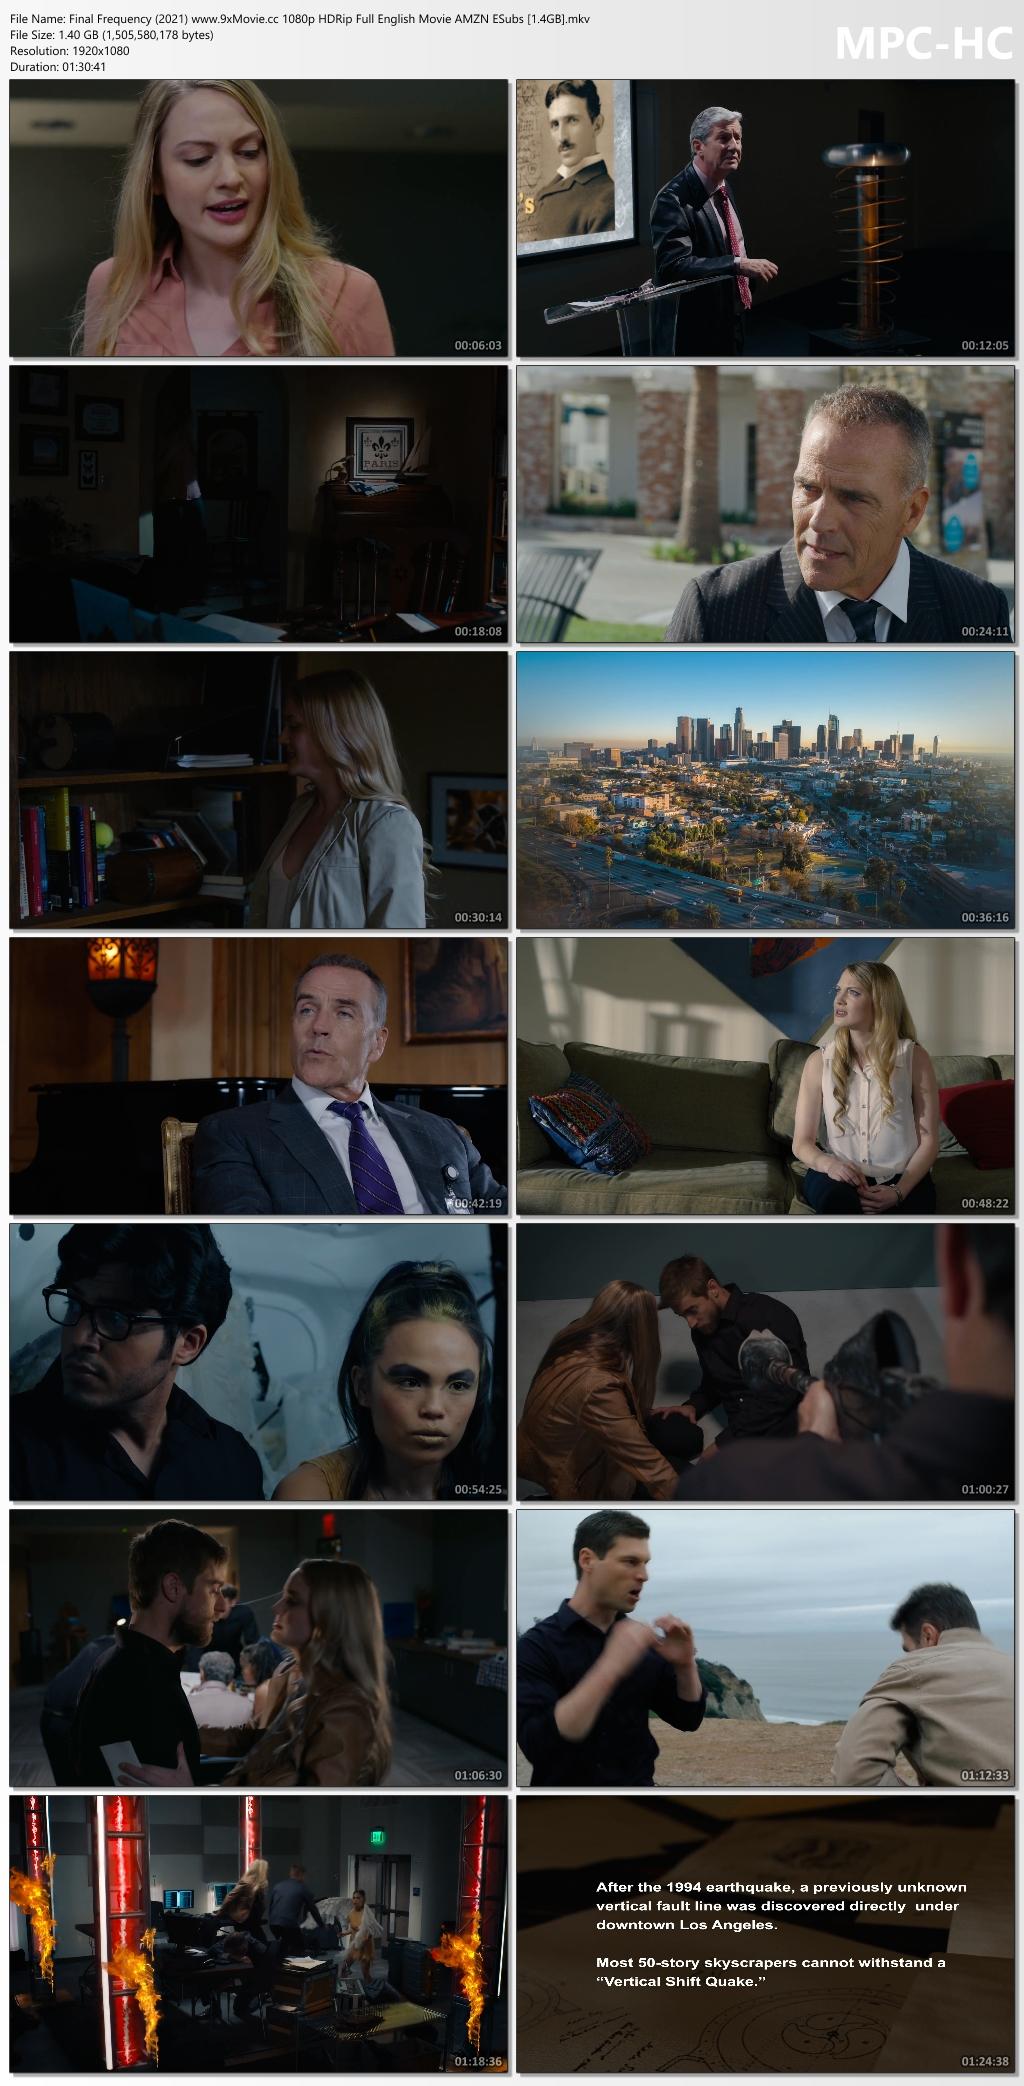 Final-Frequency-2021-www-9x-Movie-cc-1080p-HDRip-Full-English-Movie-AMZN-ESubs-1-4-GB-mkv